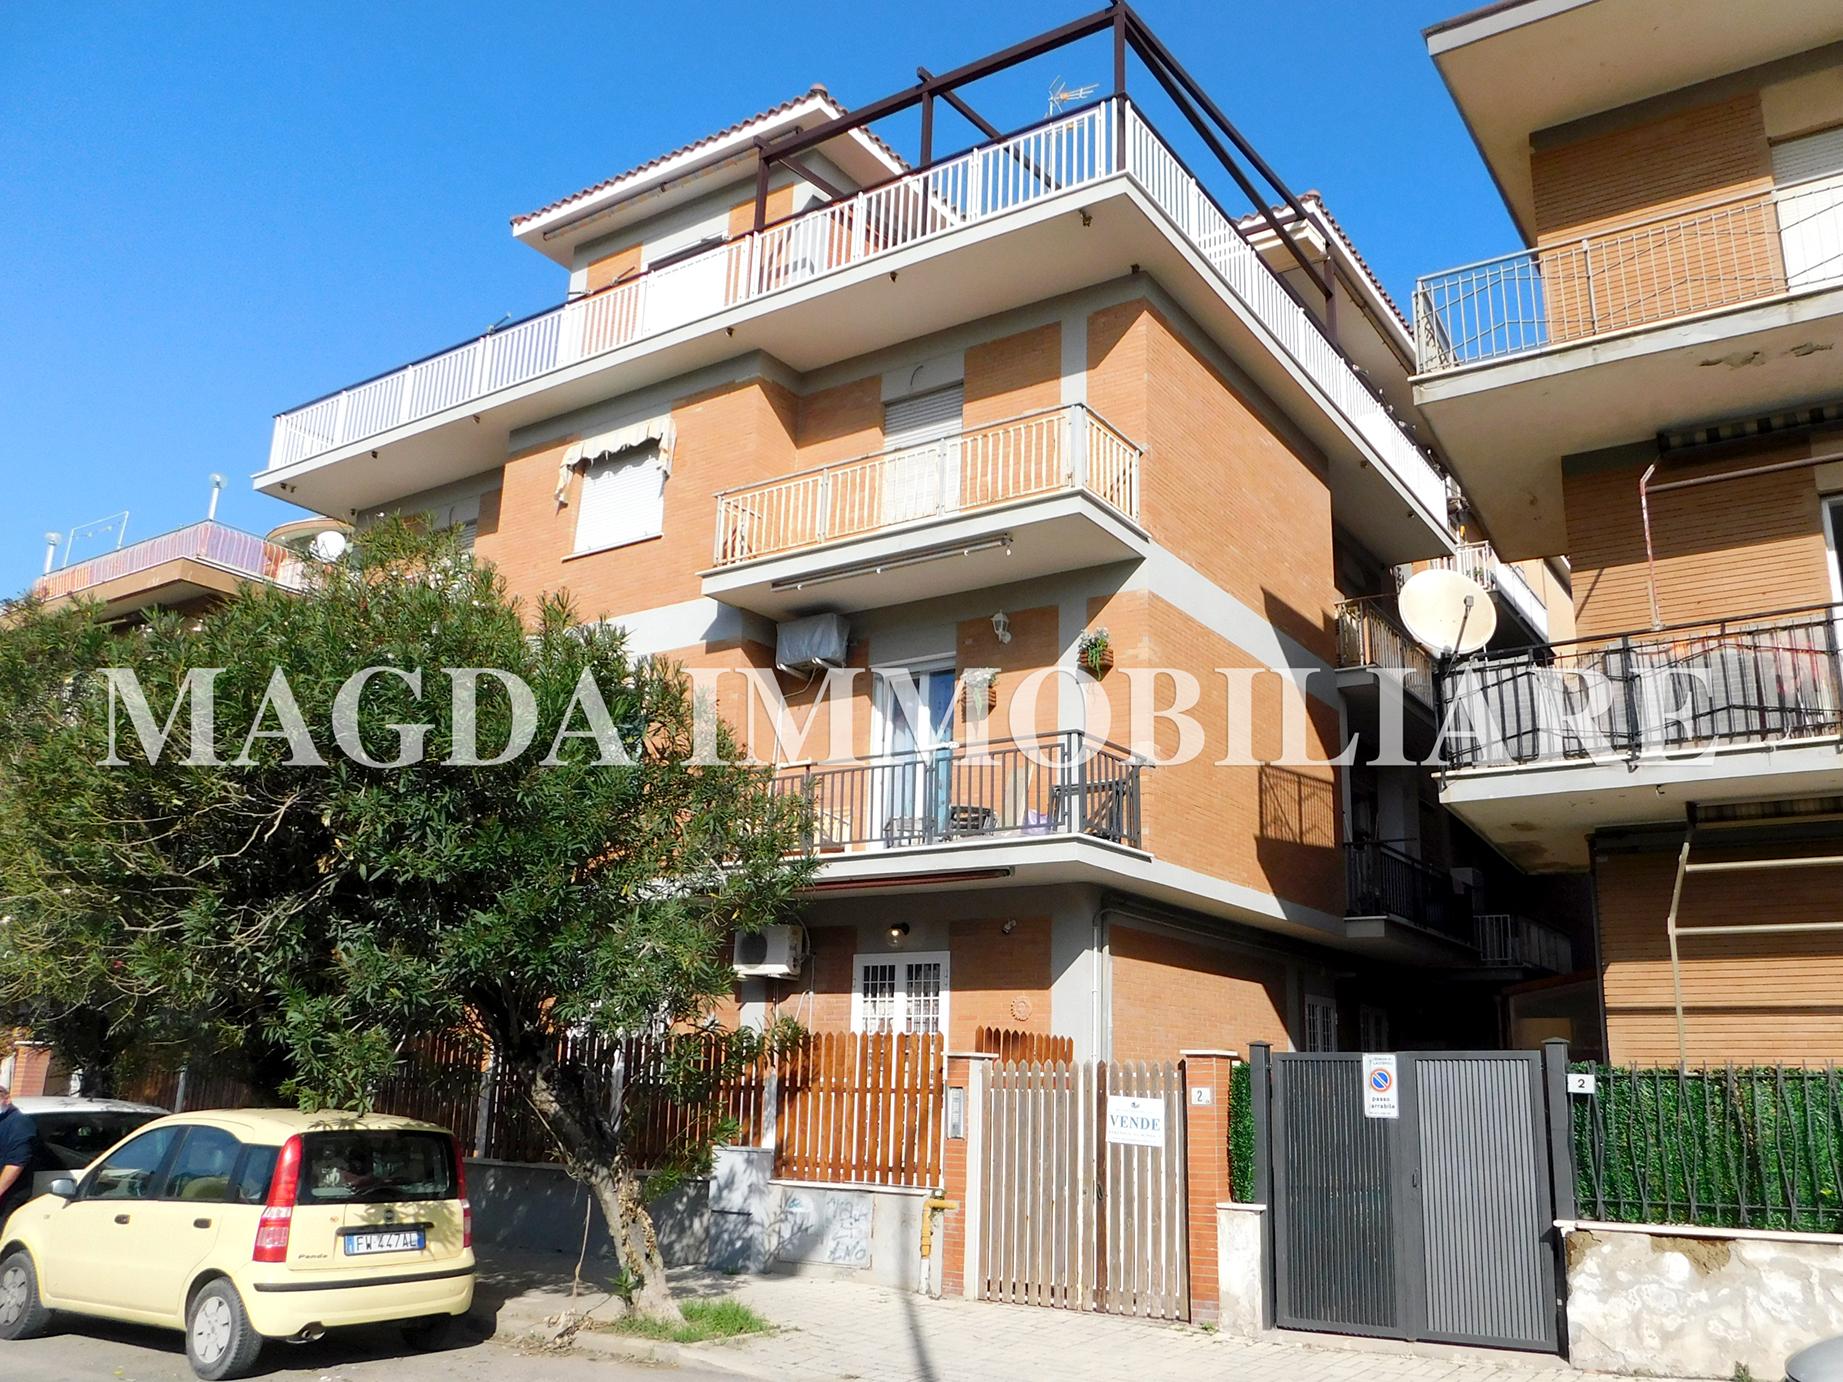 Appartamento a Ladispoli - Via Roma, 2